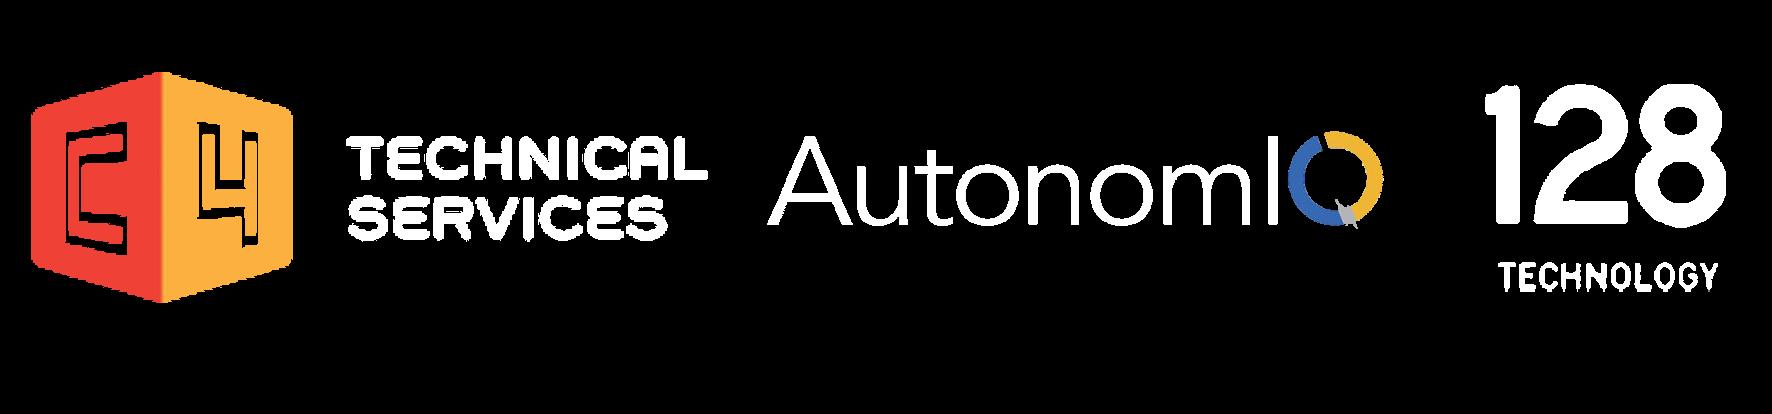 C4 Technical Services